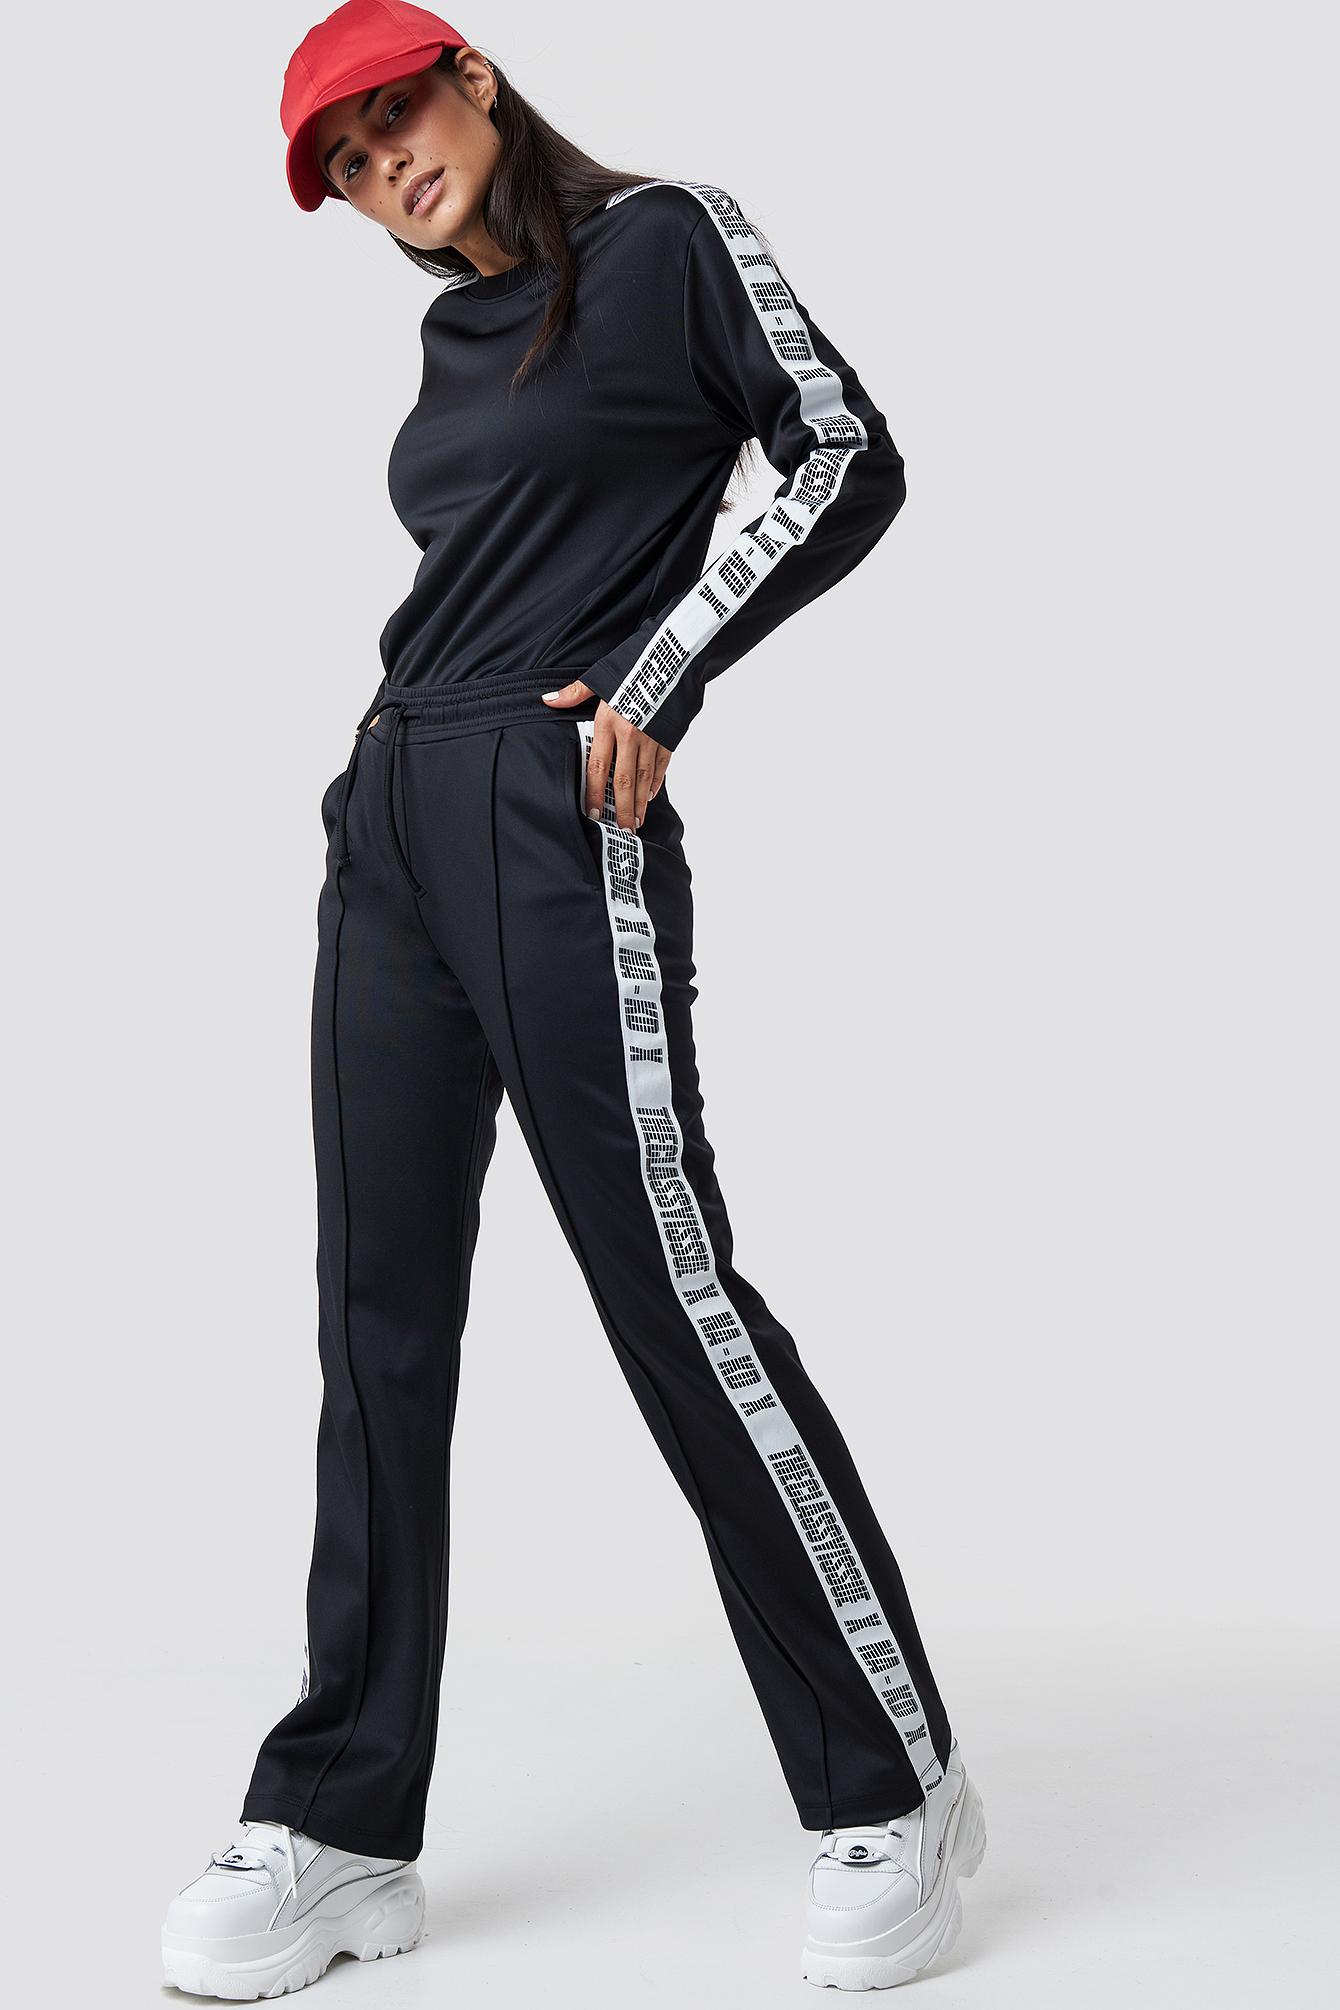 The Classy Pants NA-KDLOUNGE.DE